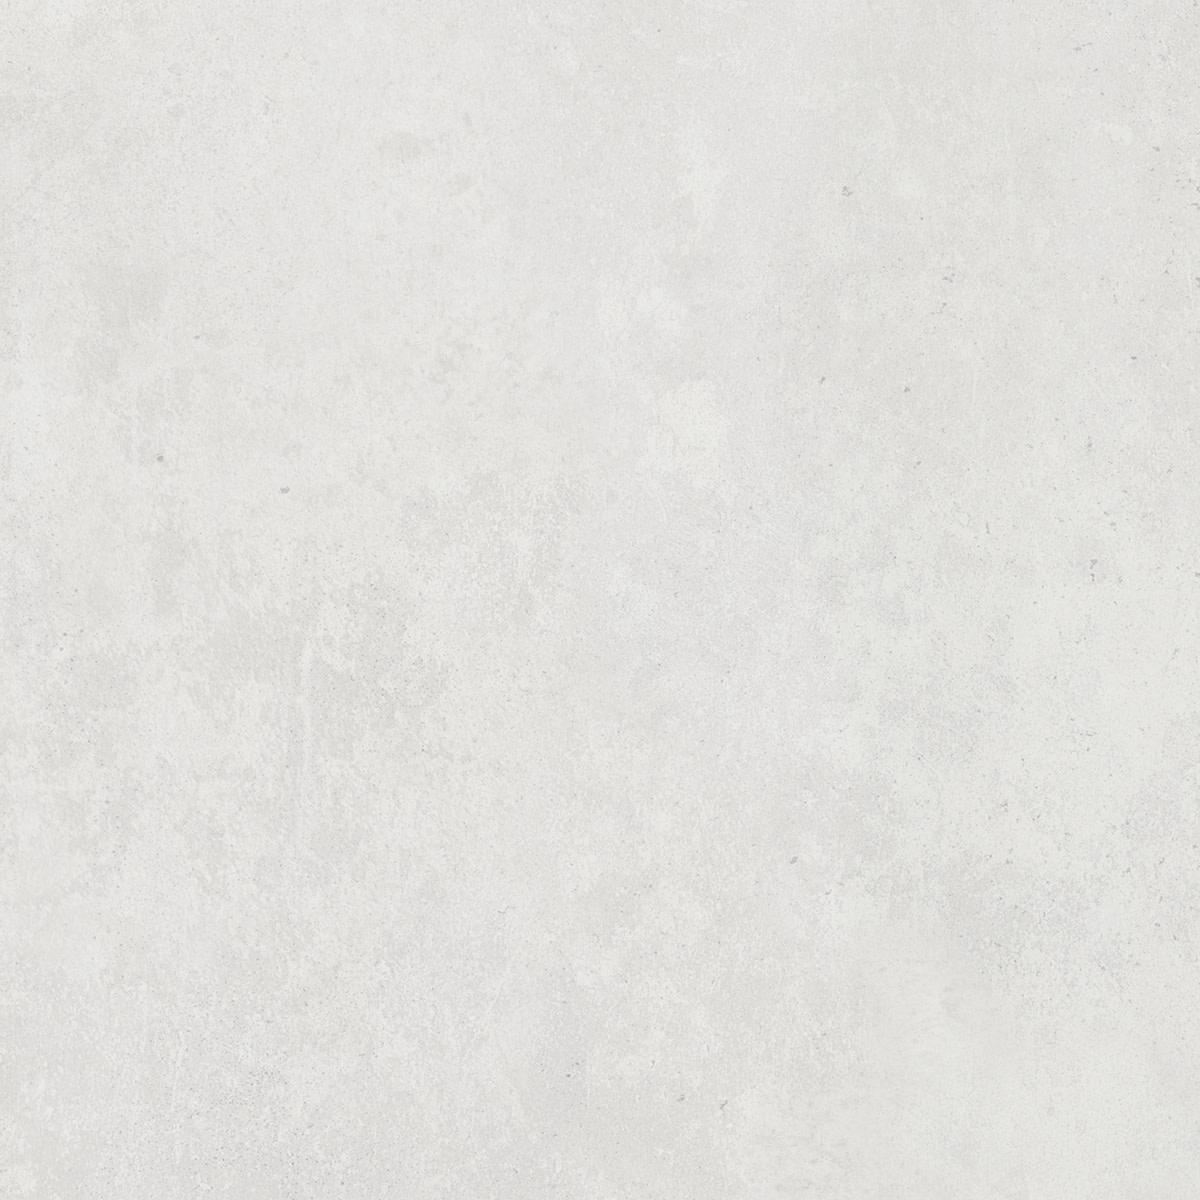 ПЛИТА НАПОЛ GRUNGE MIX GREY 42Х42 123М2